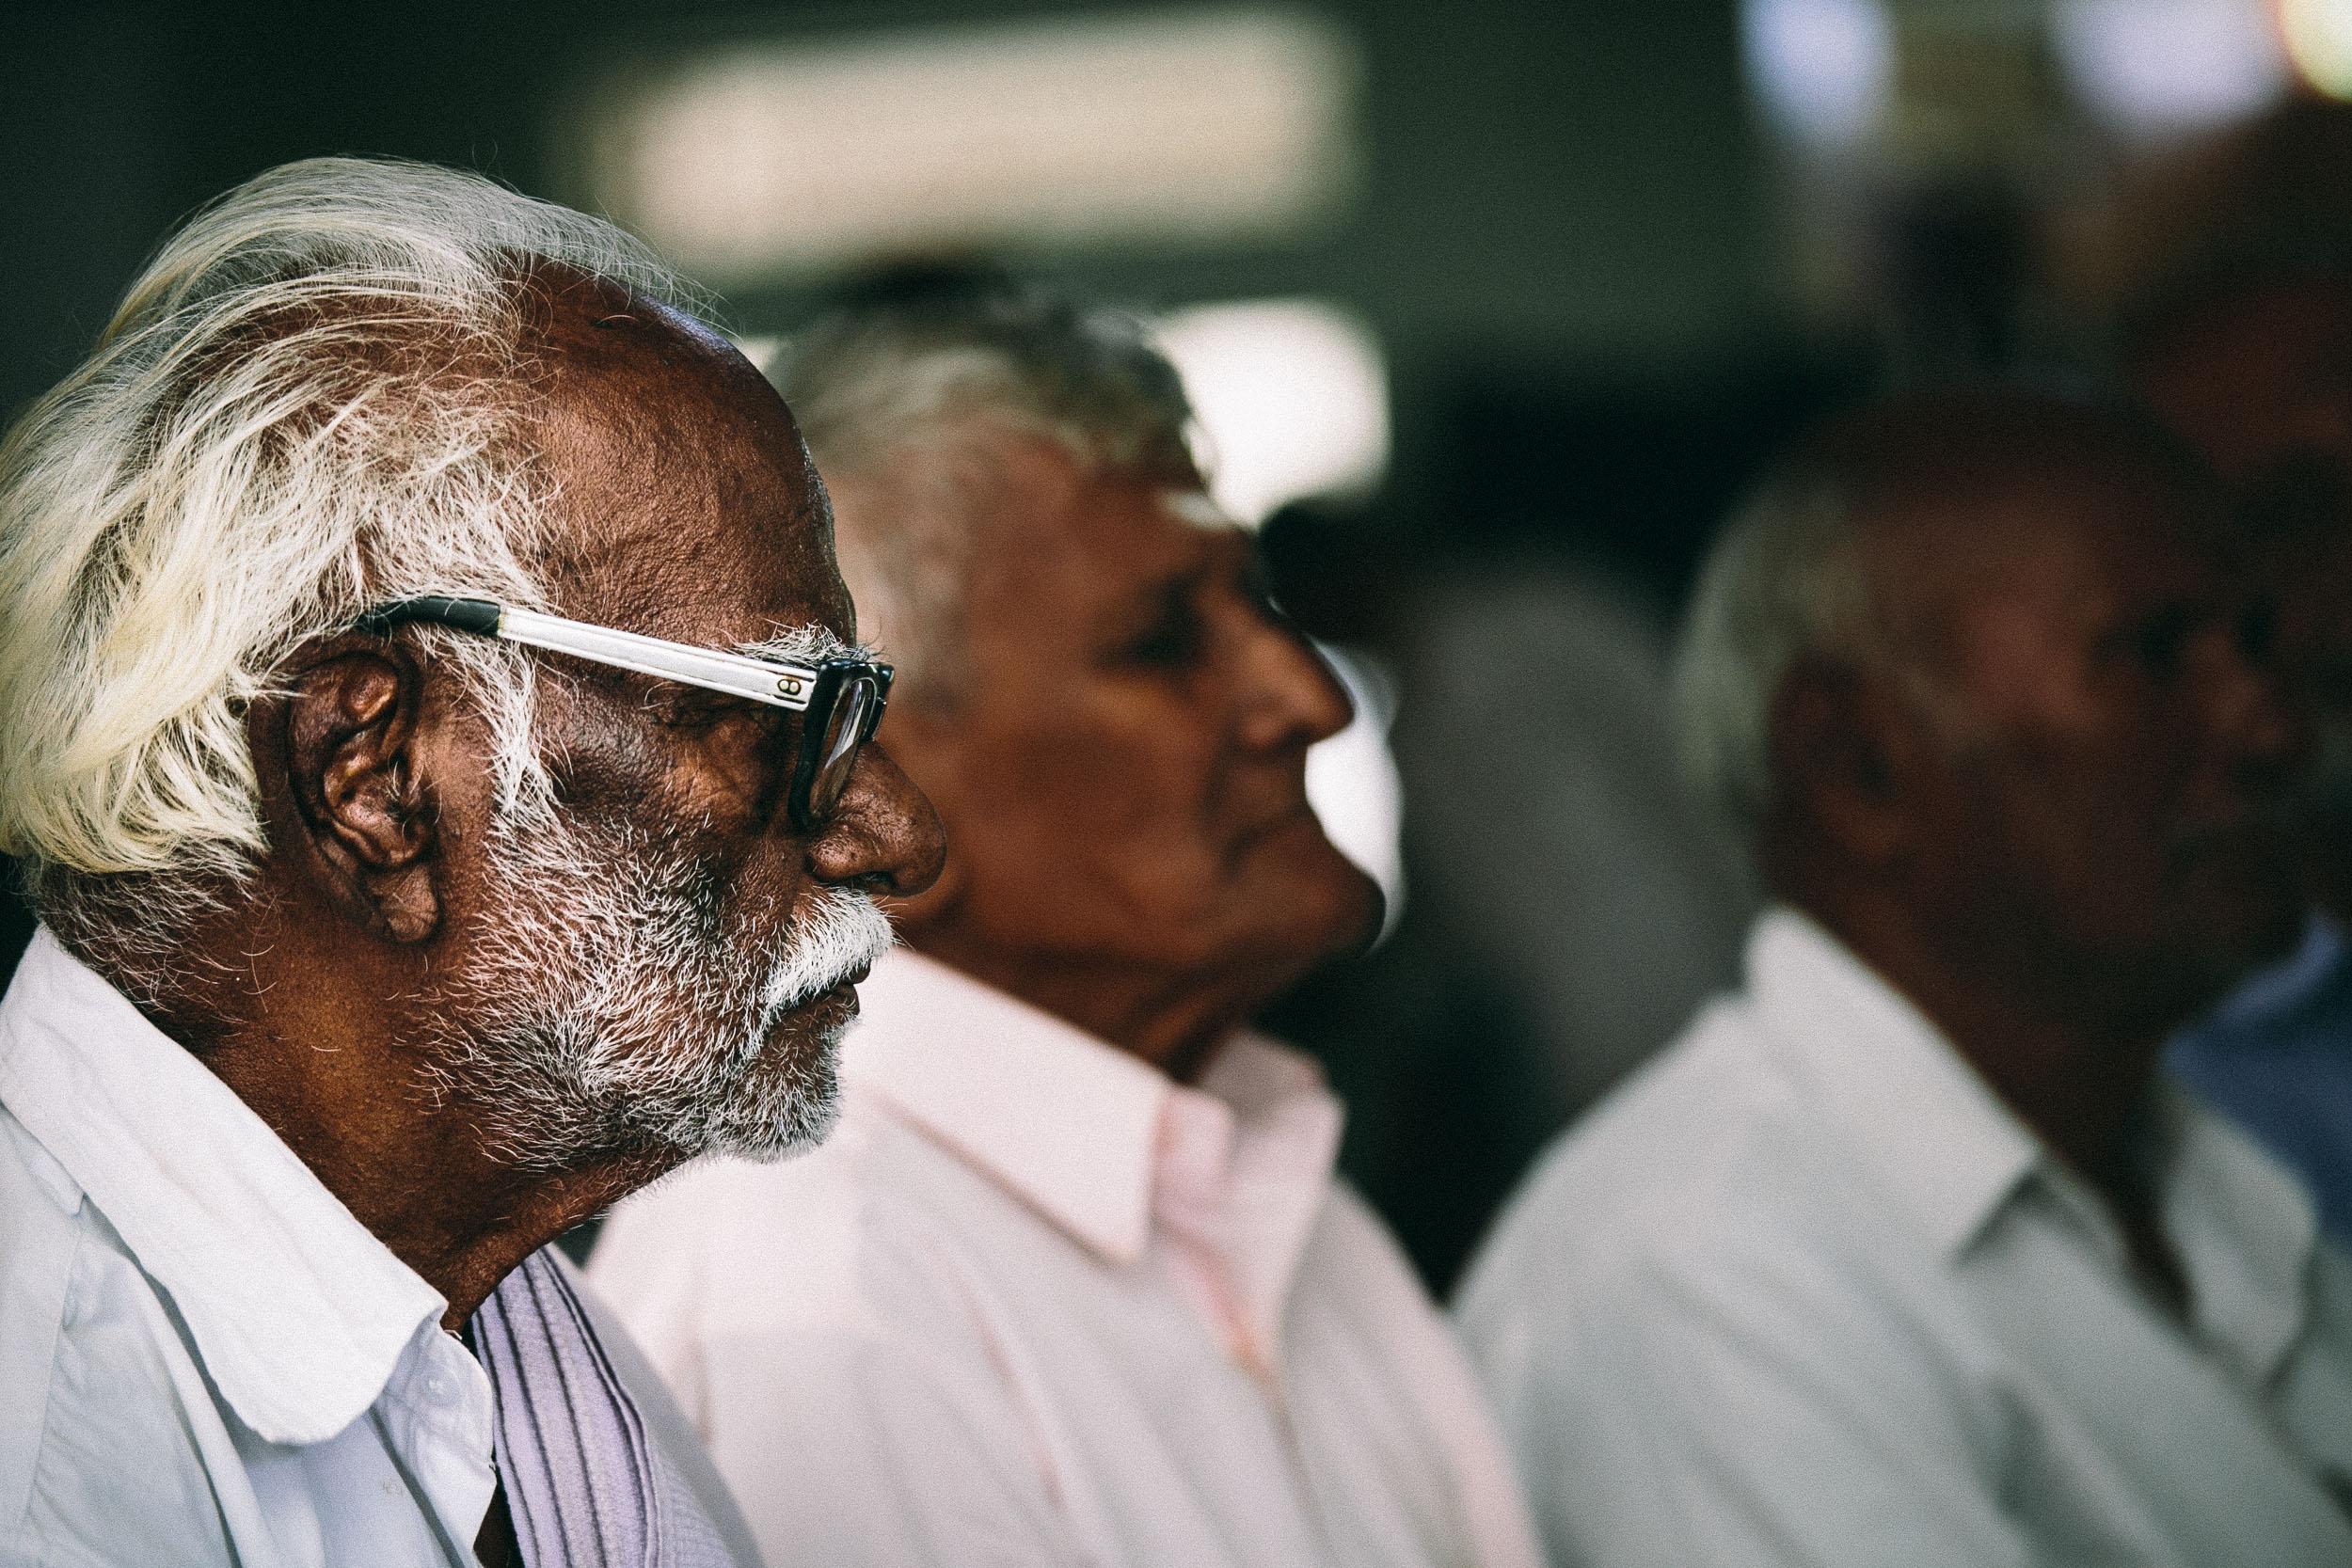 brian-callaway-india-photography-aravind-eye-hospital-24.jpg